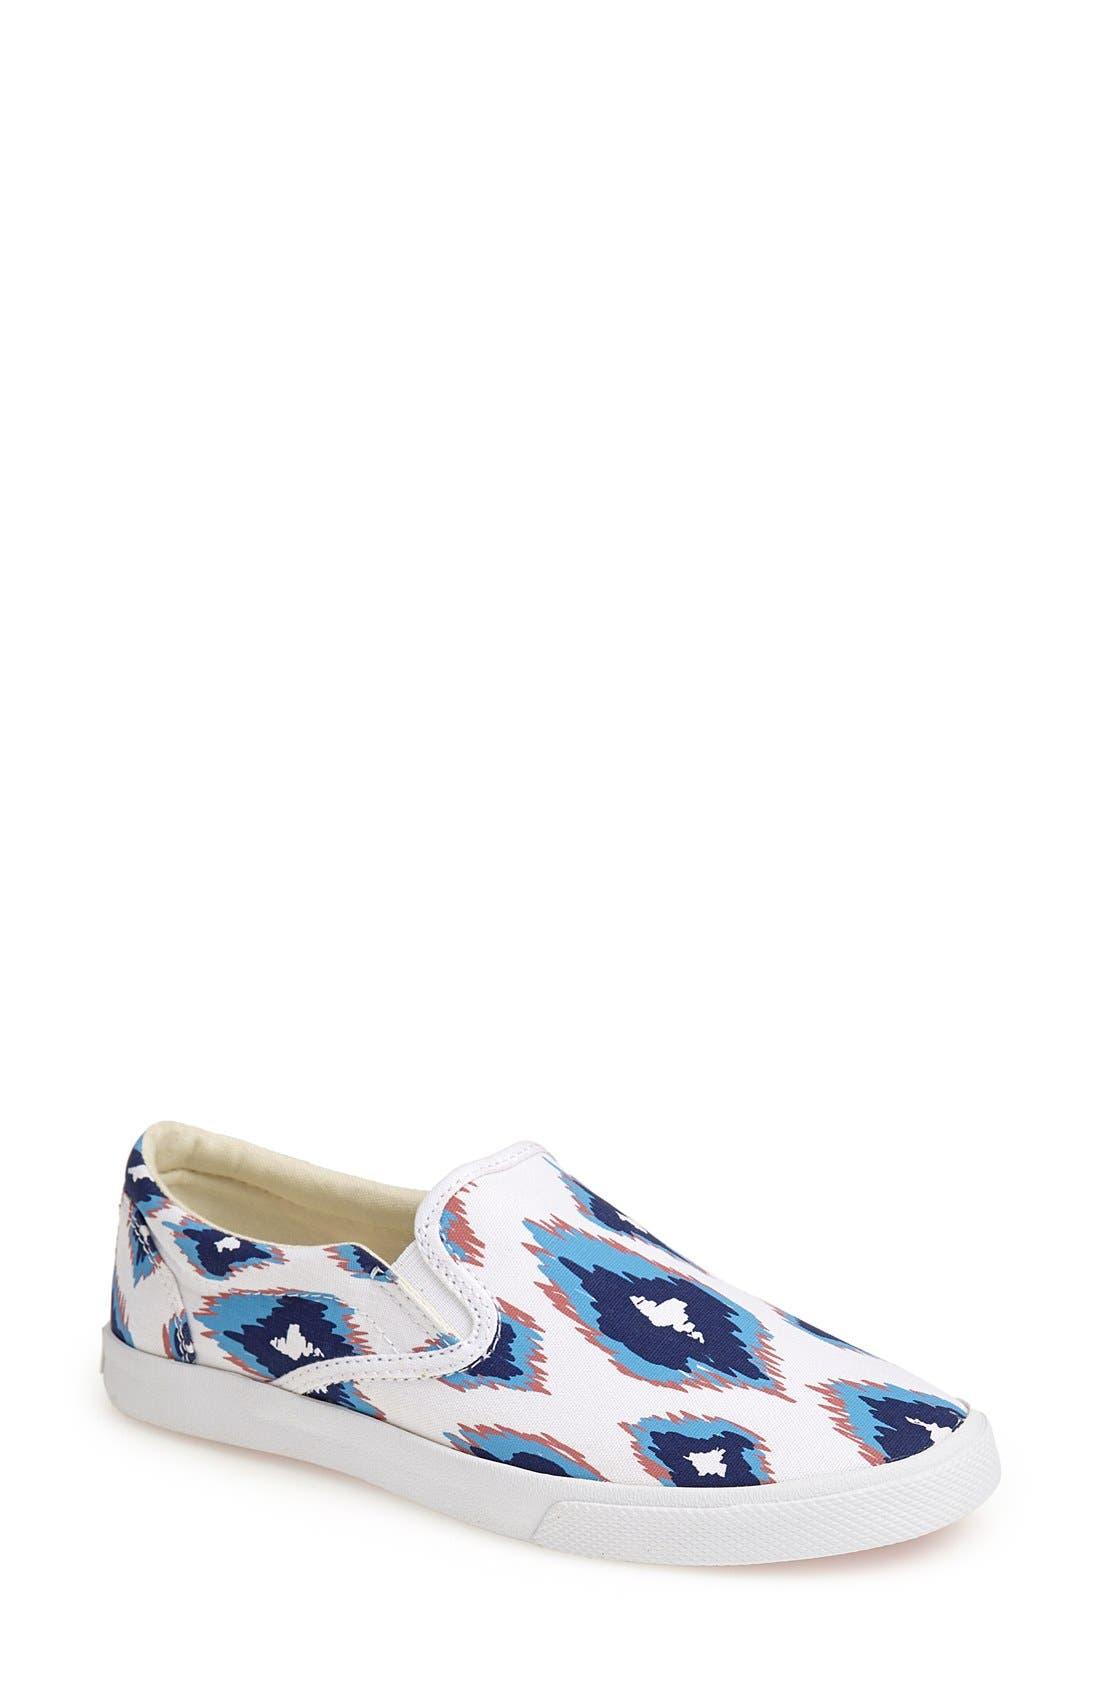 Alternate Image 1 Selected - BucketFeet 'Splash' Slip-On Sneaker (Women)